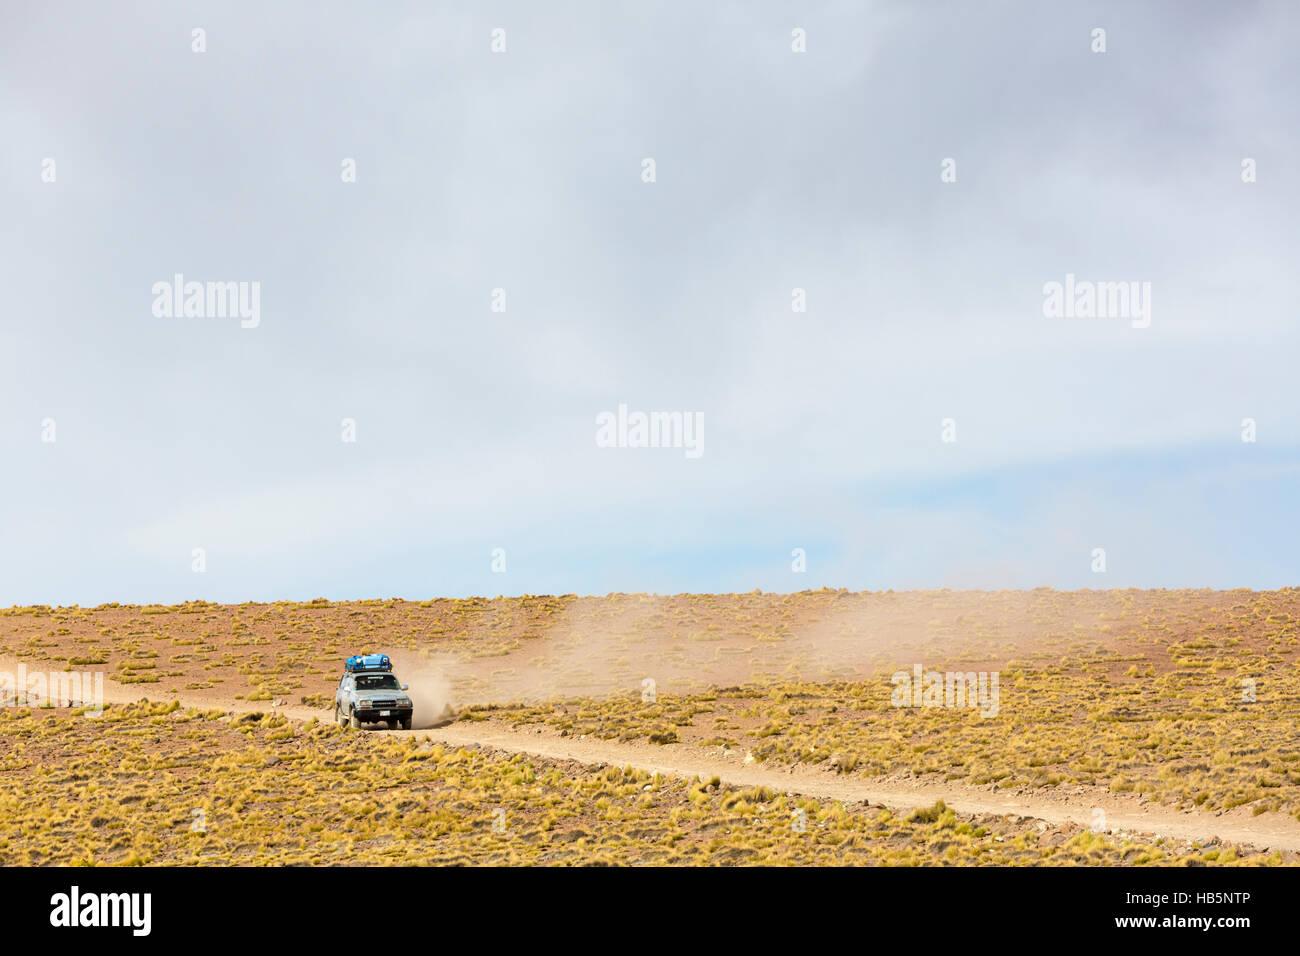 Off-road vehicle driving in the Atacama desert, Bolivia - Stock Image